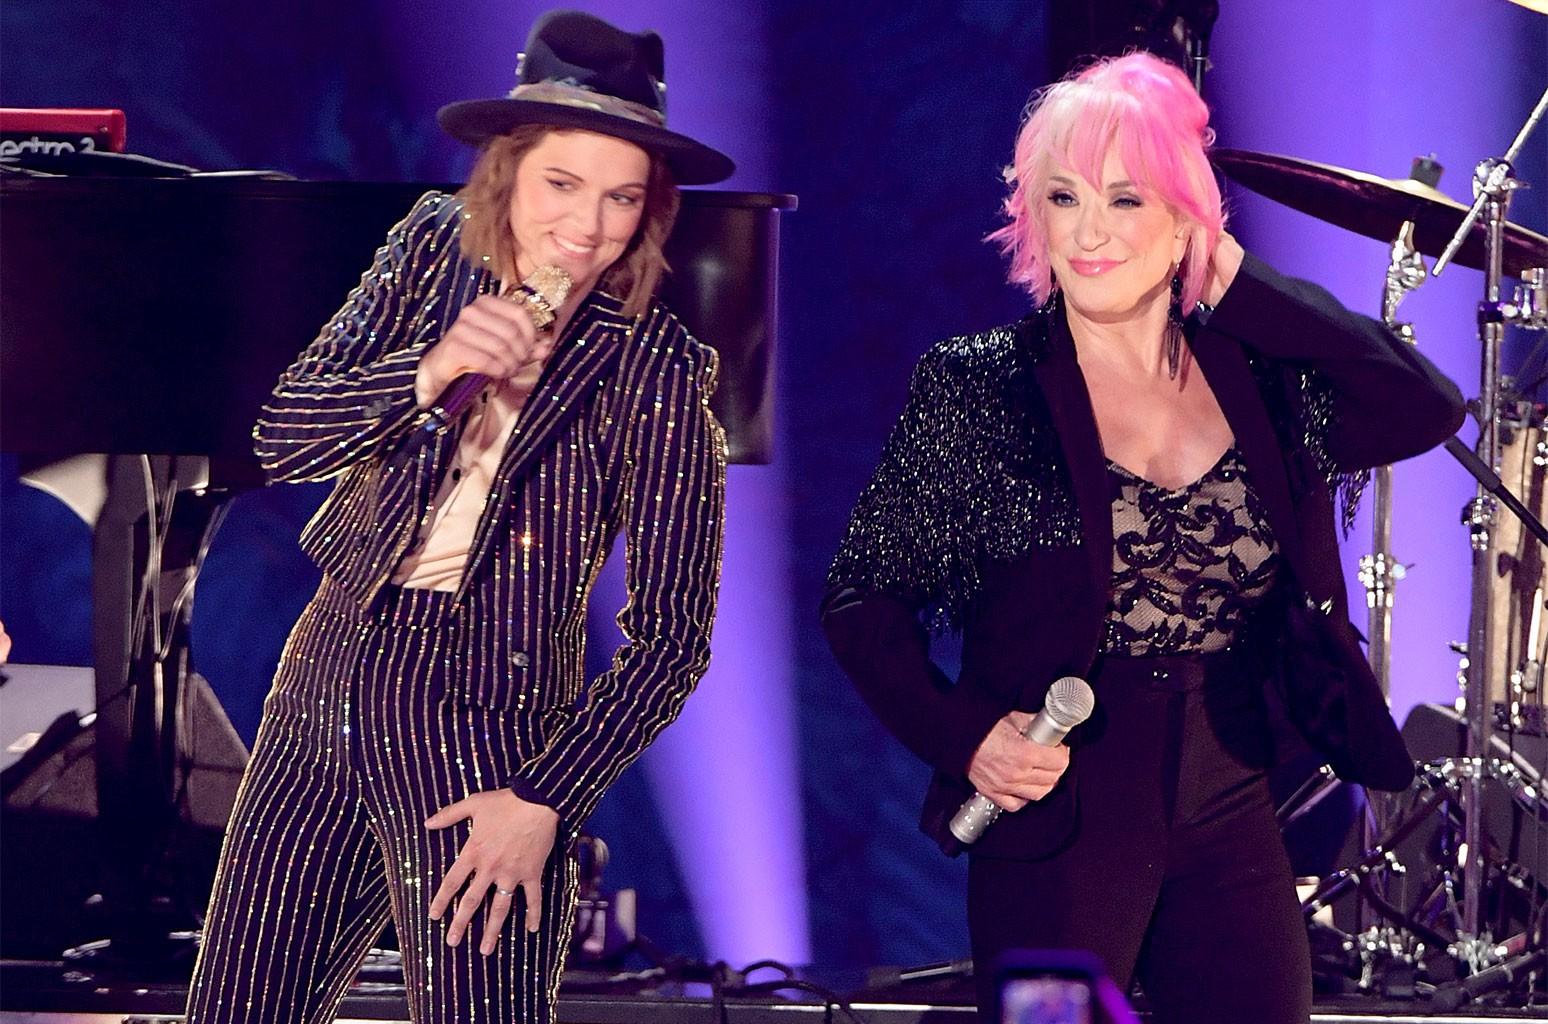 Brandi Carlile and Tanya Tucker perform at the 2019 CMT Music Awards at Bridgestone Arena on June 5, 2019 in Nashville.